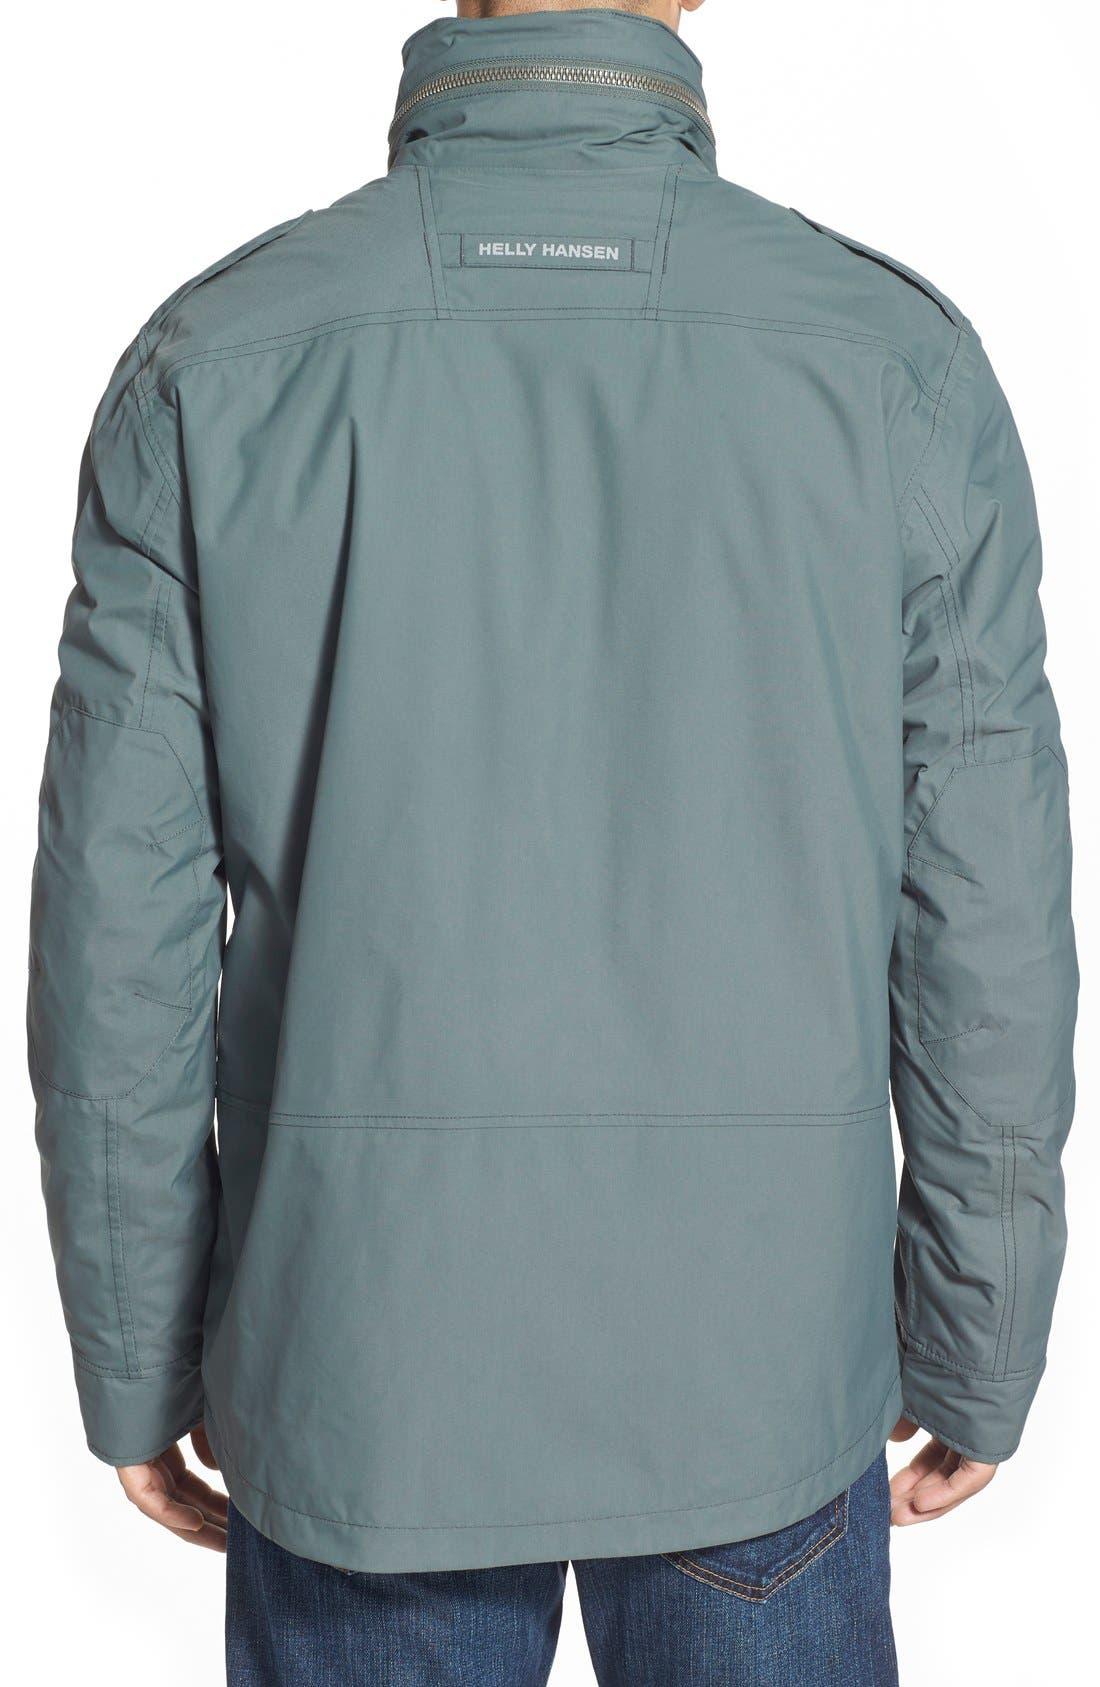 HellyHansen 'Universal' MotoRain Jacket,                             Alternate thumbnail 7, color,                             080